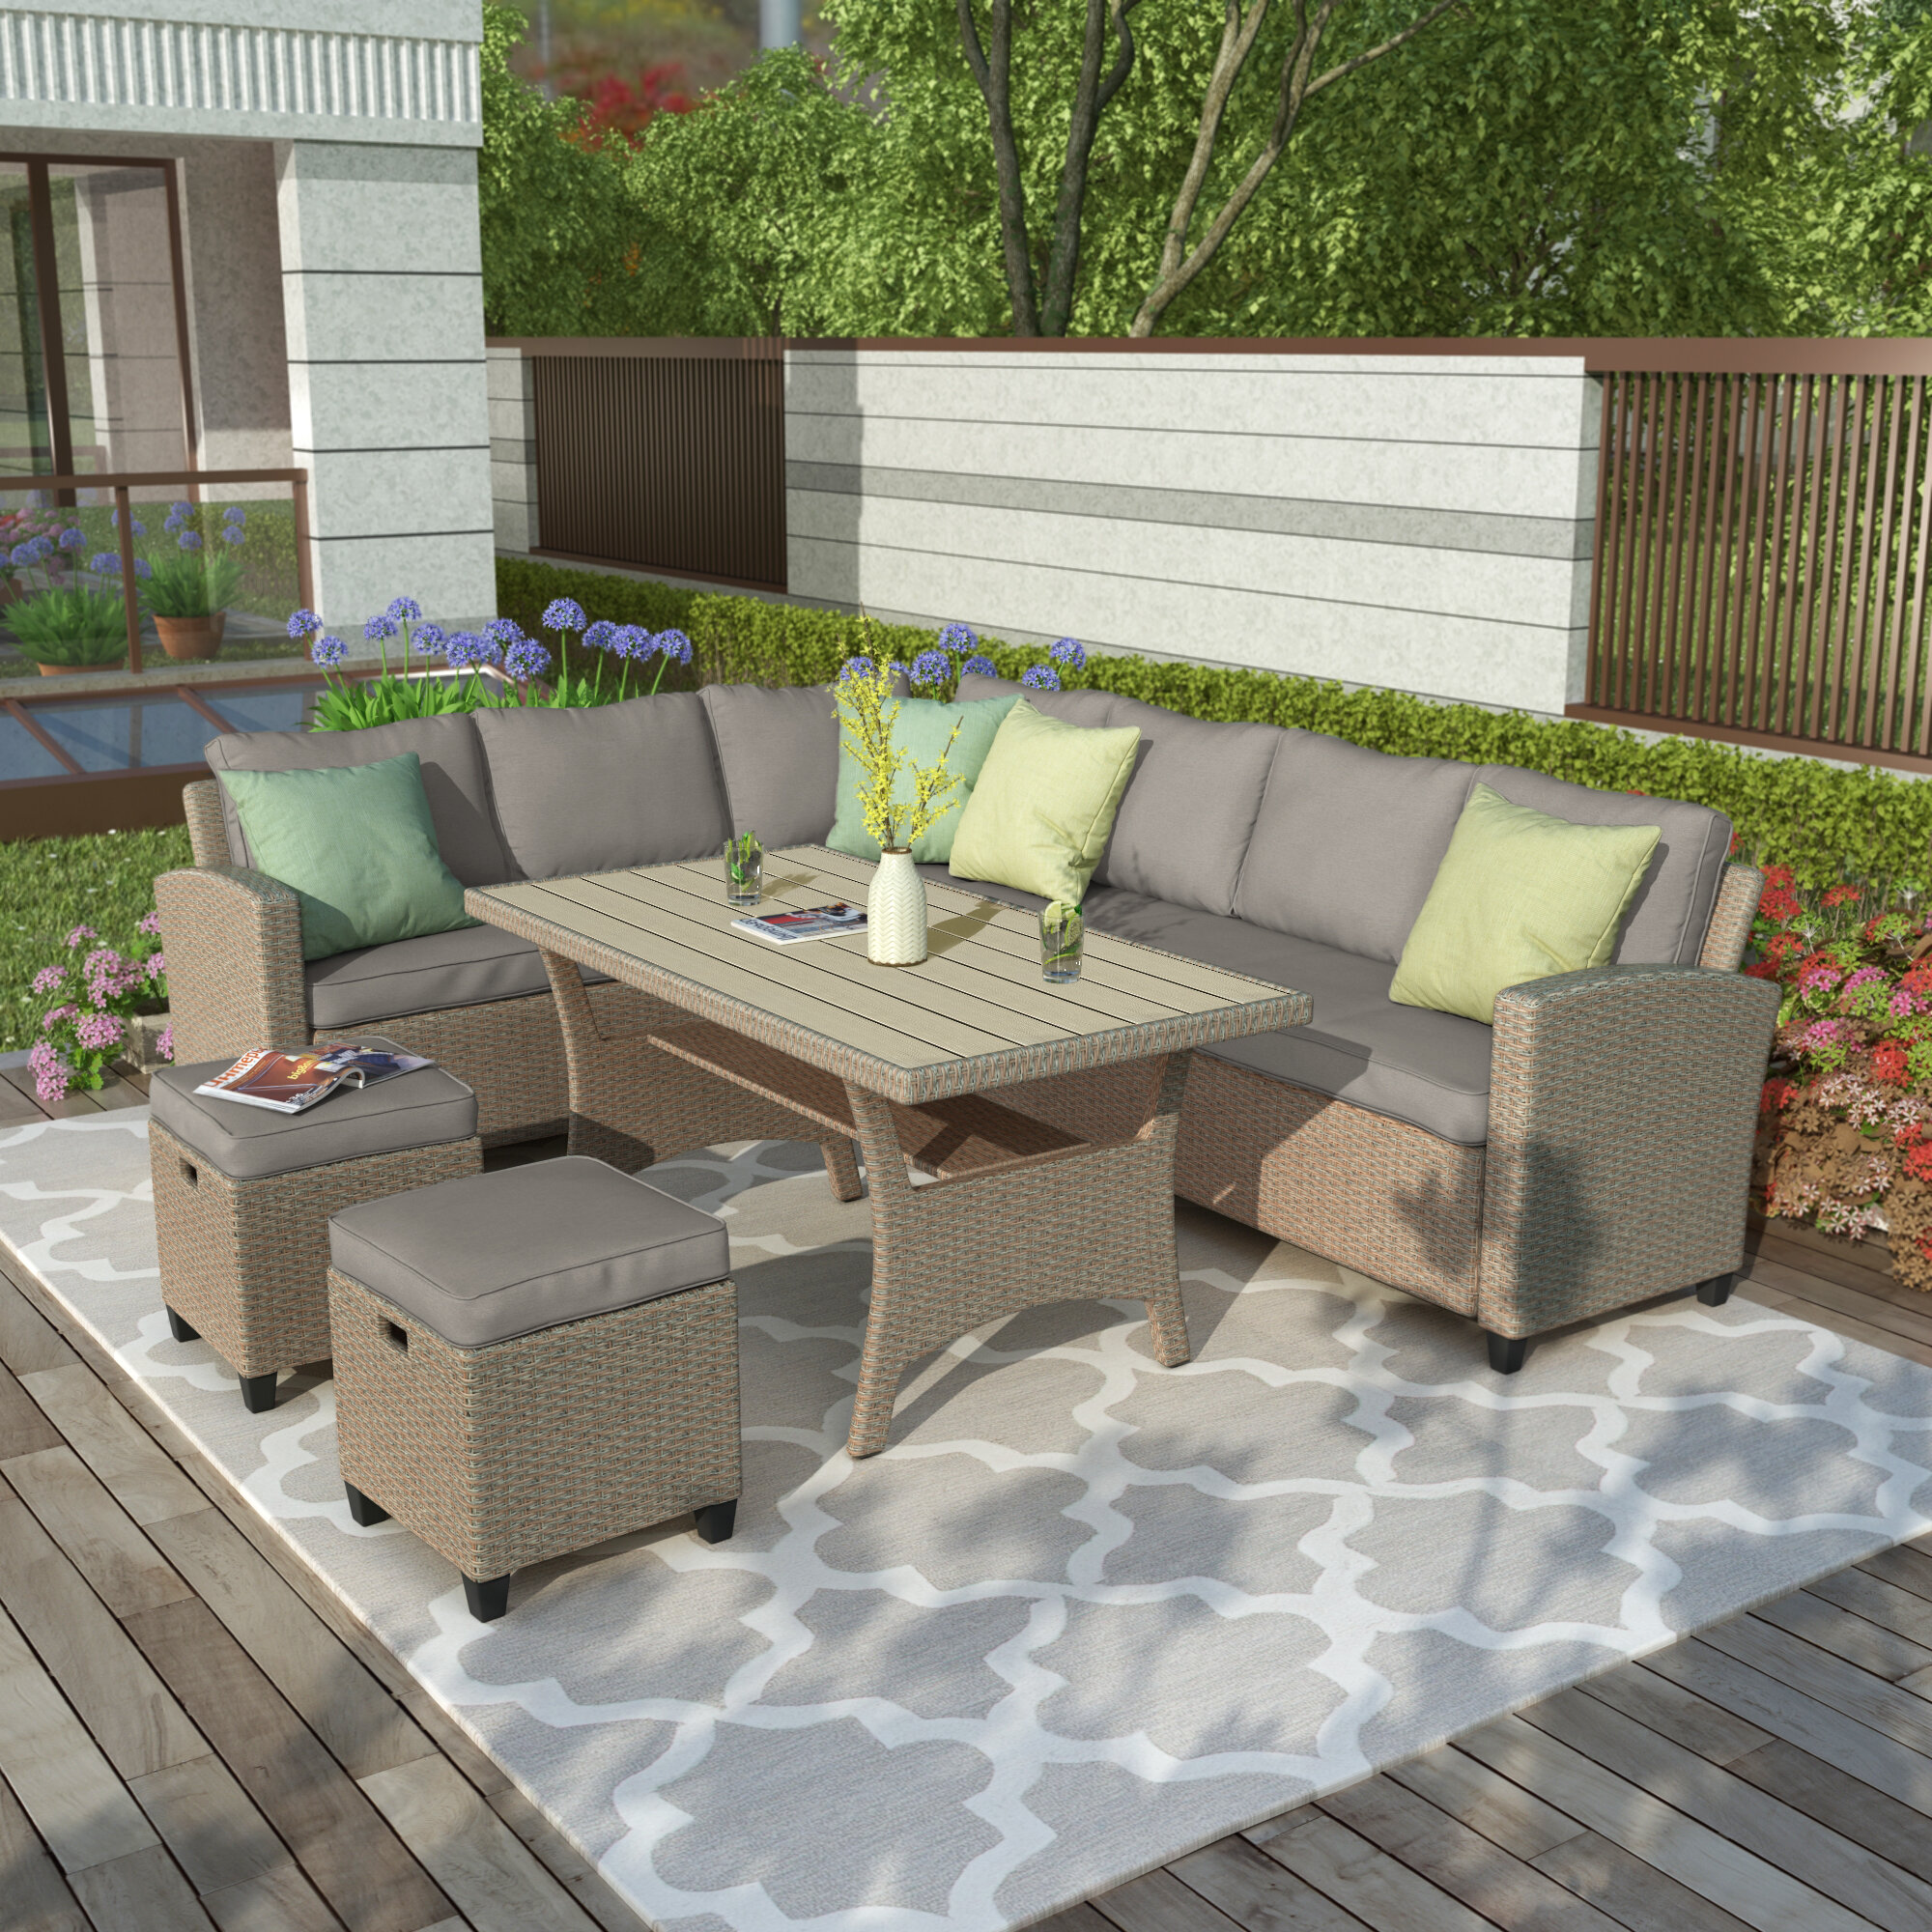 Red Barrel Studio® Patio Furniture Set, 5 Piece Outdoor